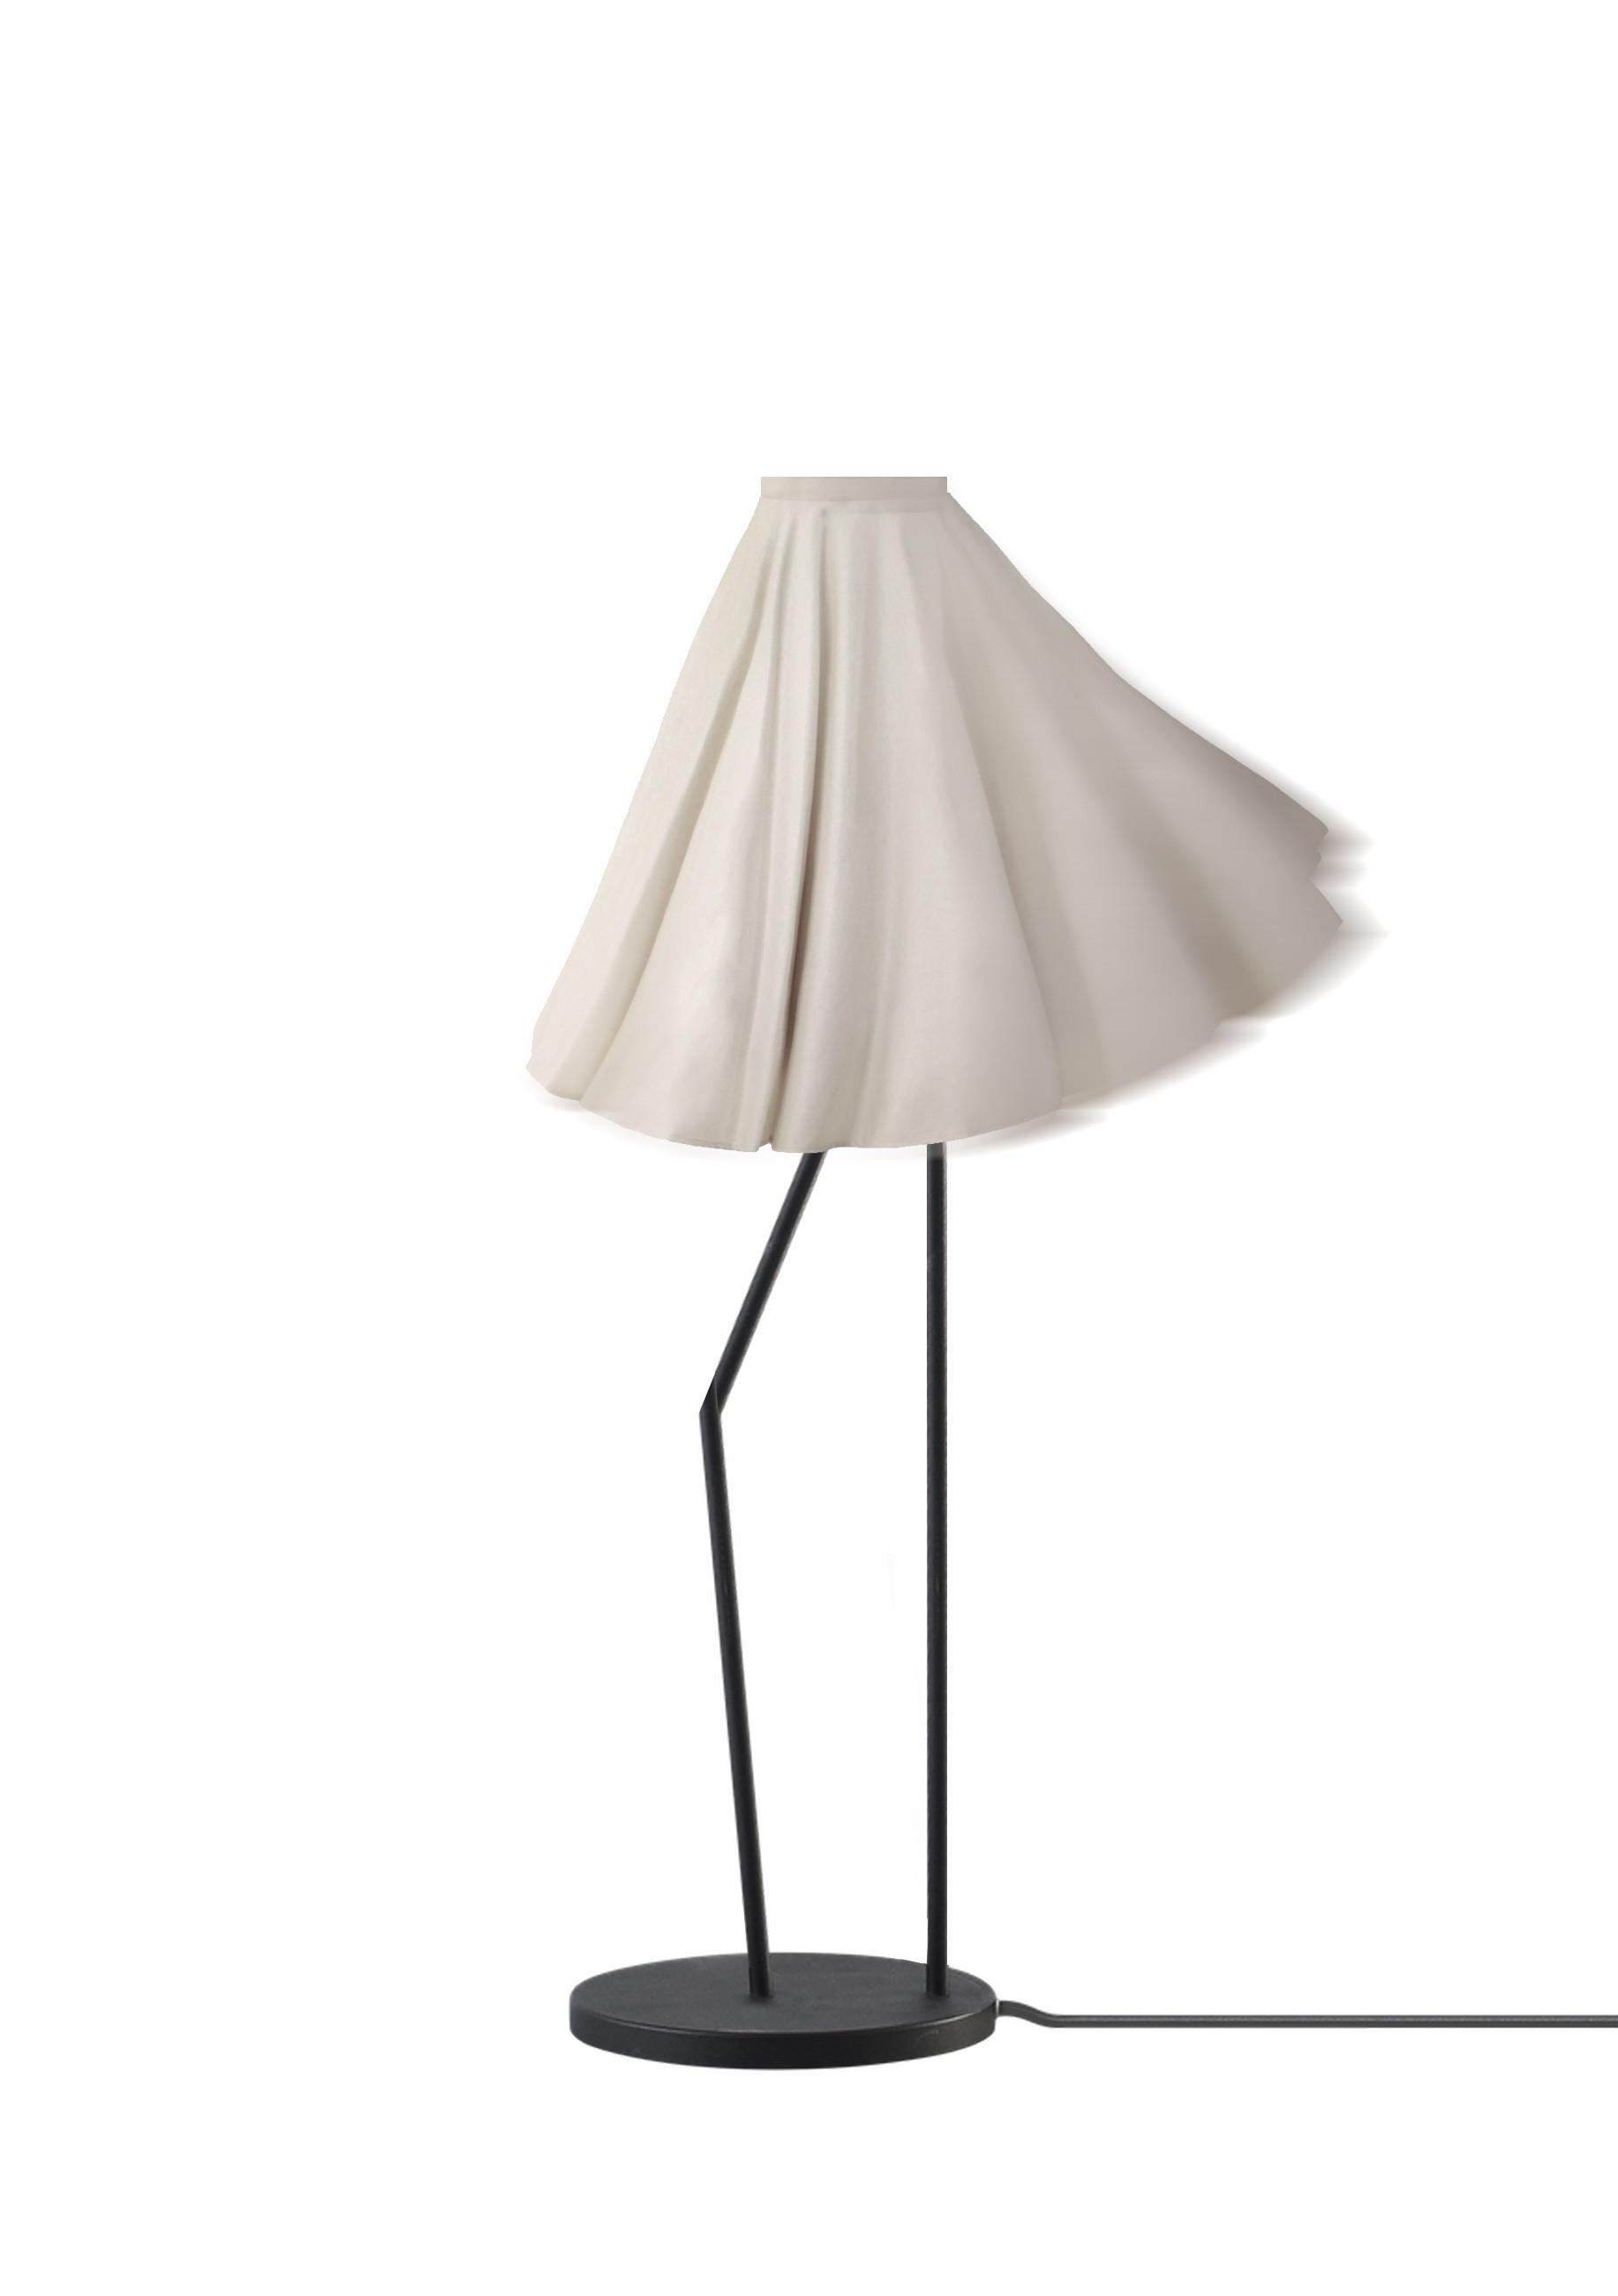 jonathan vessiere design lamp 7.jpg